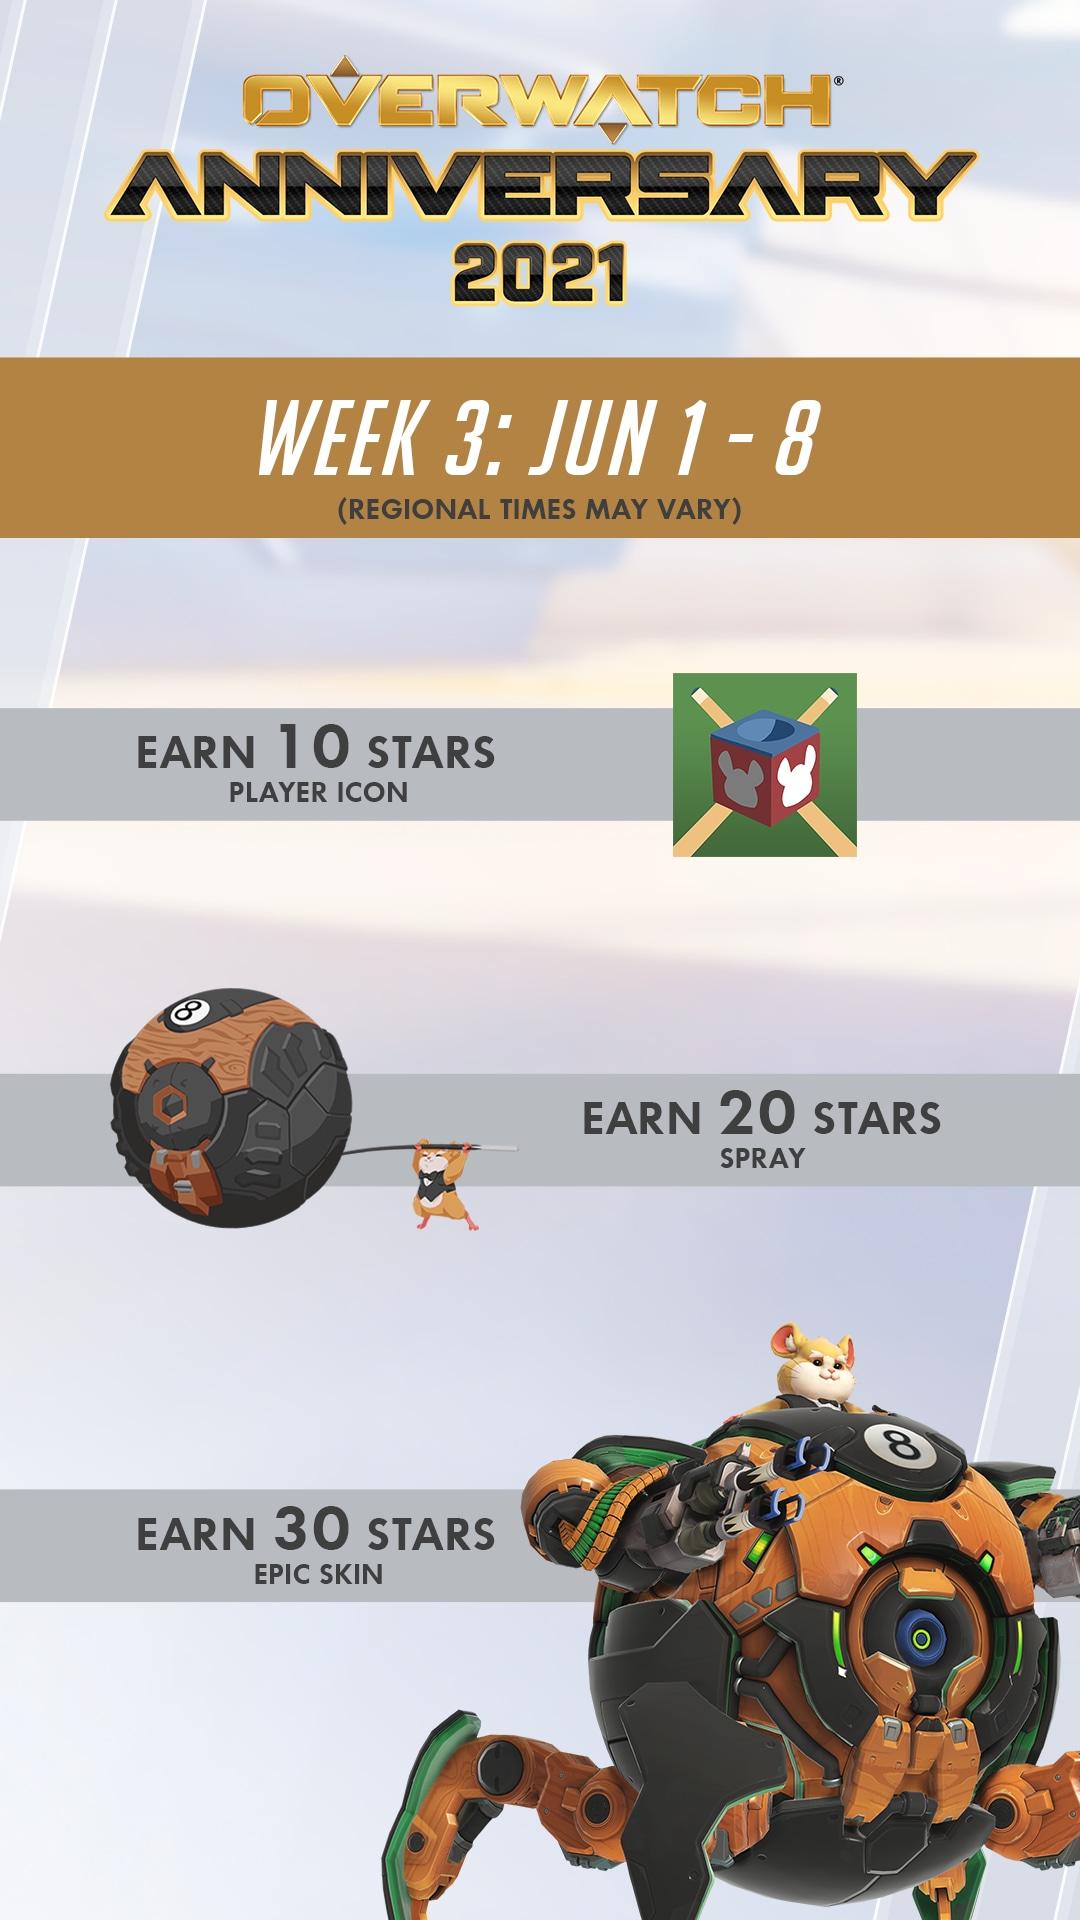 Week 3 Rewards